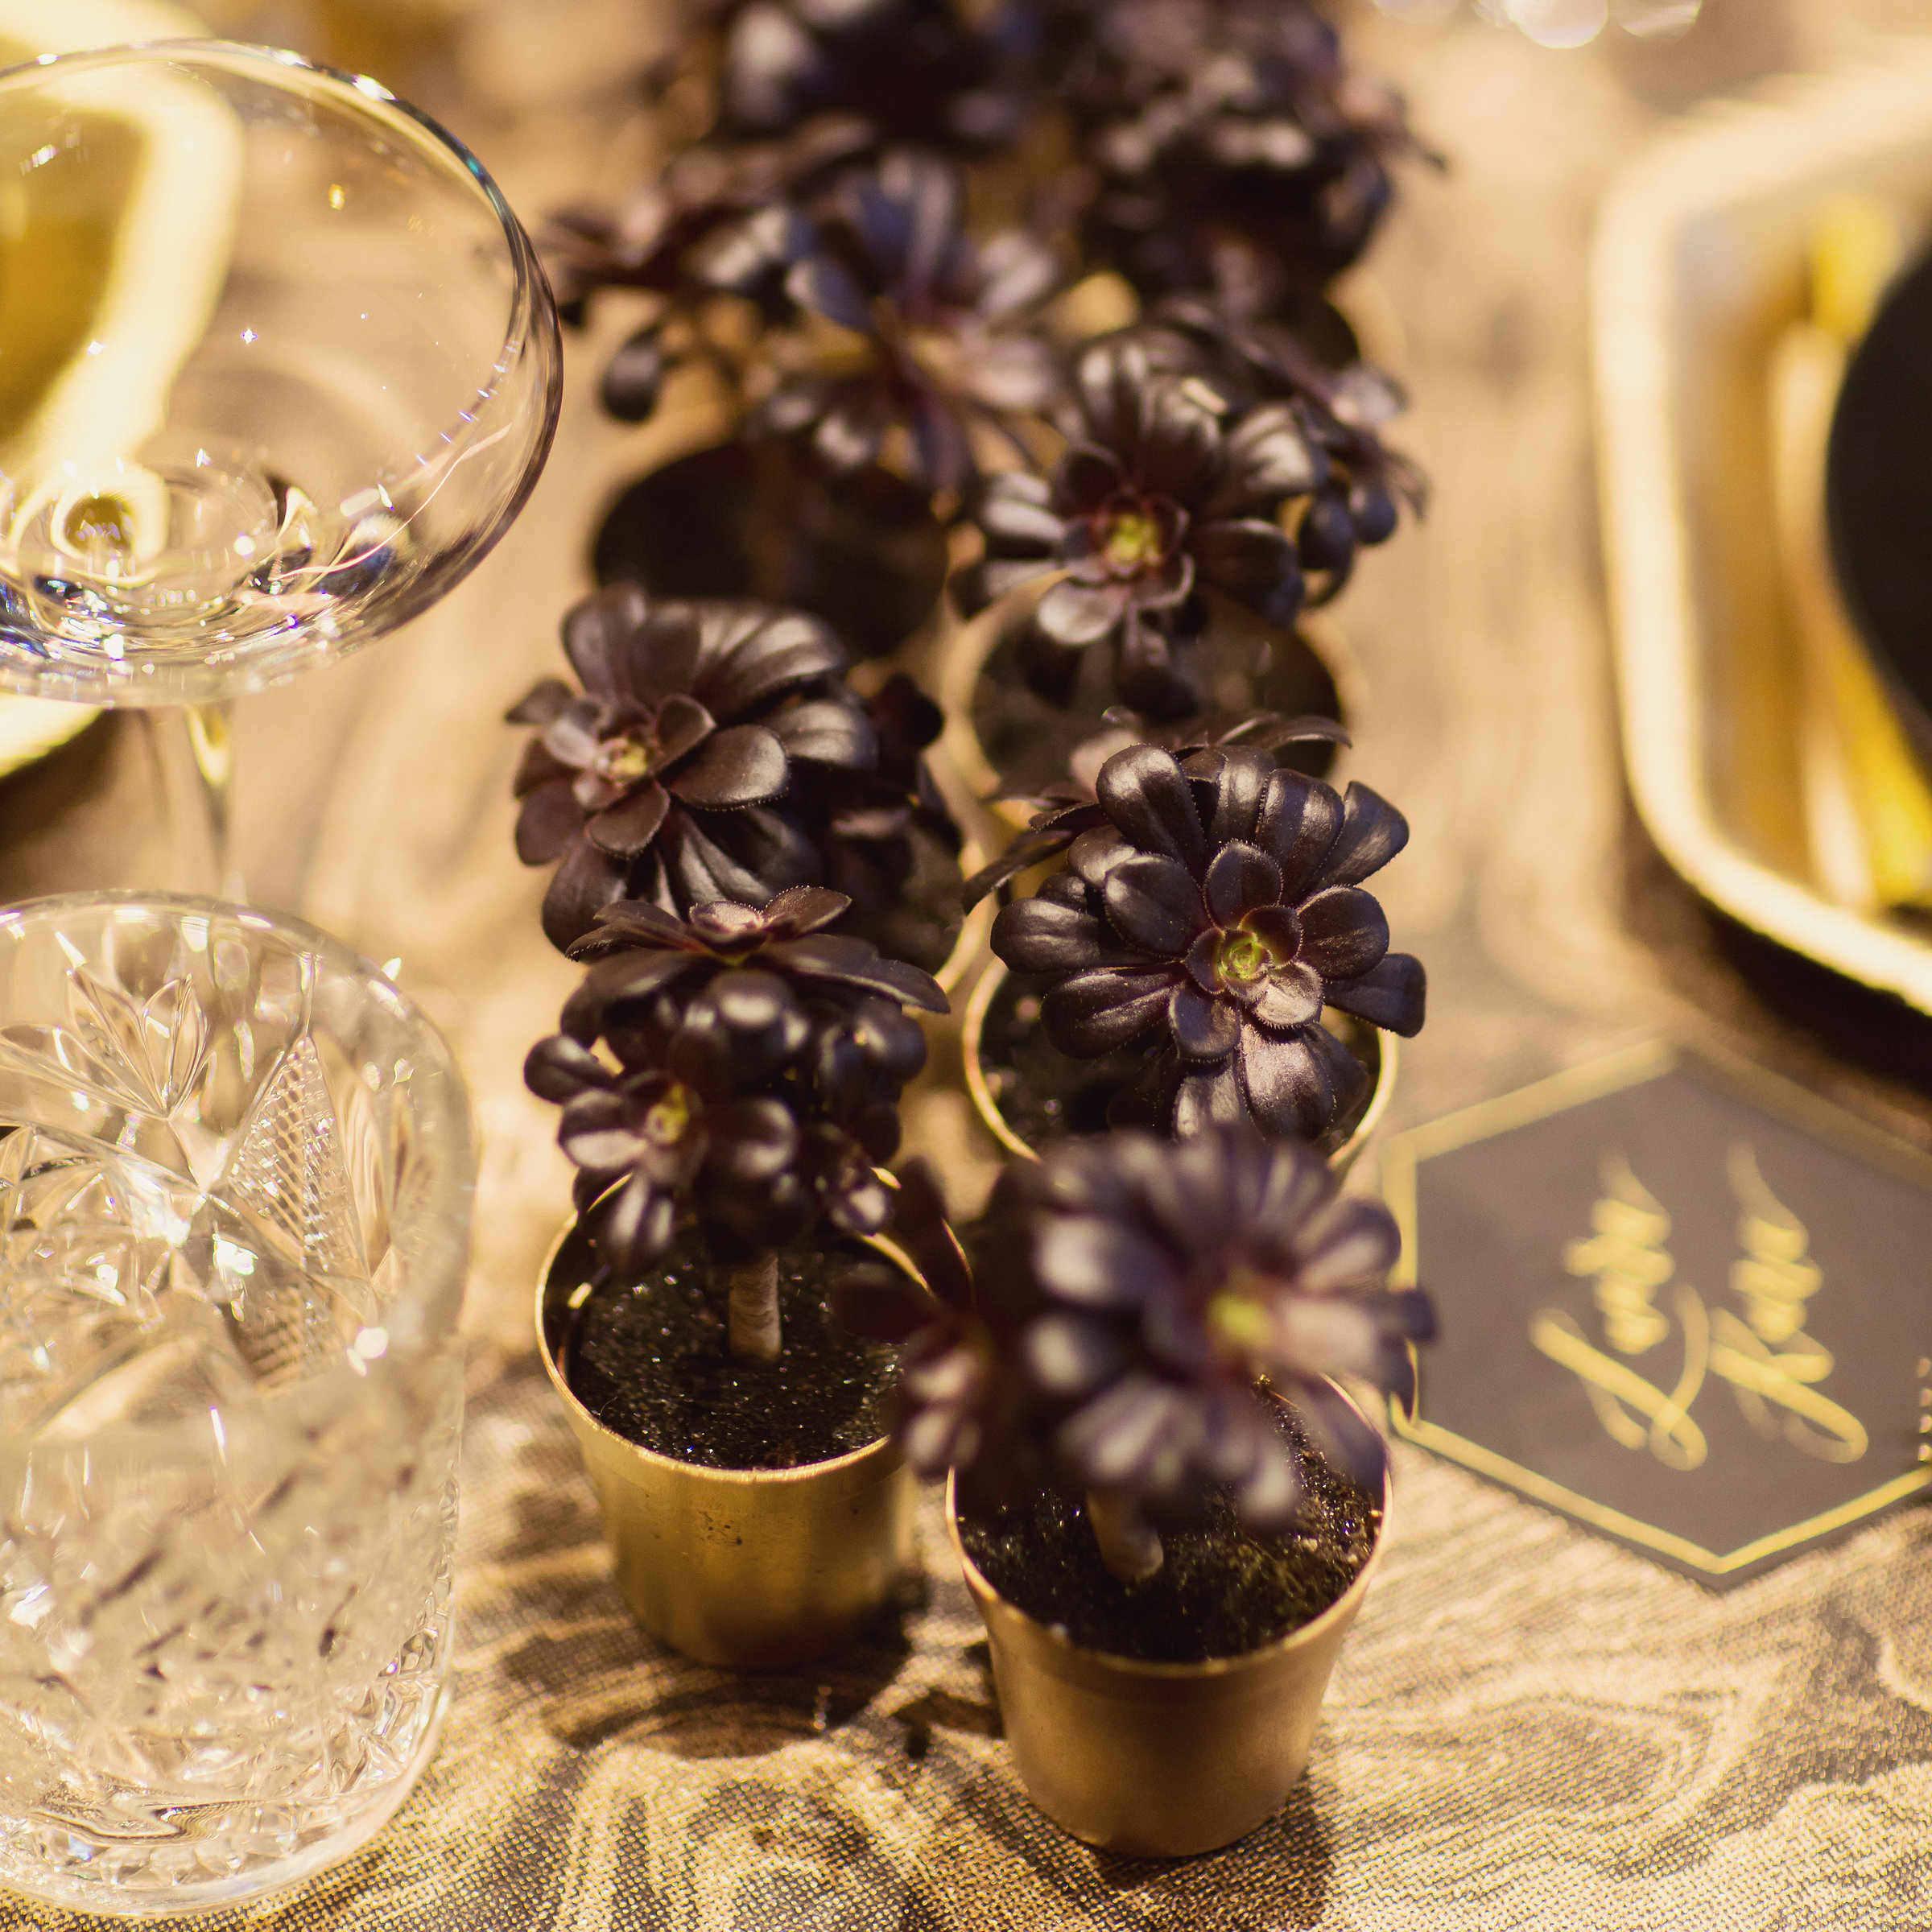 Black aeonium schwarzkopf in gold pots for dinner table centrepiece